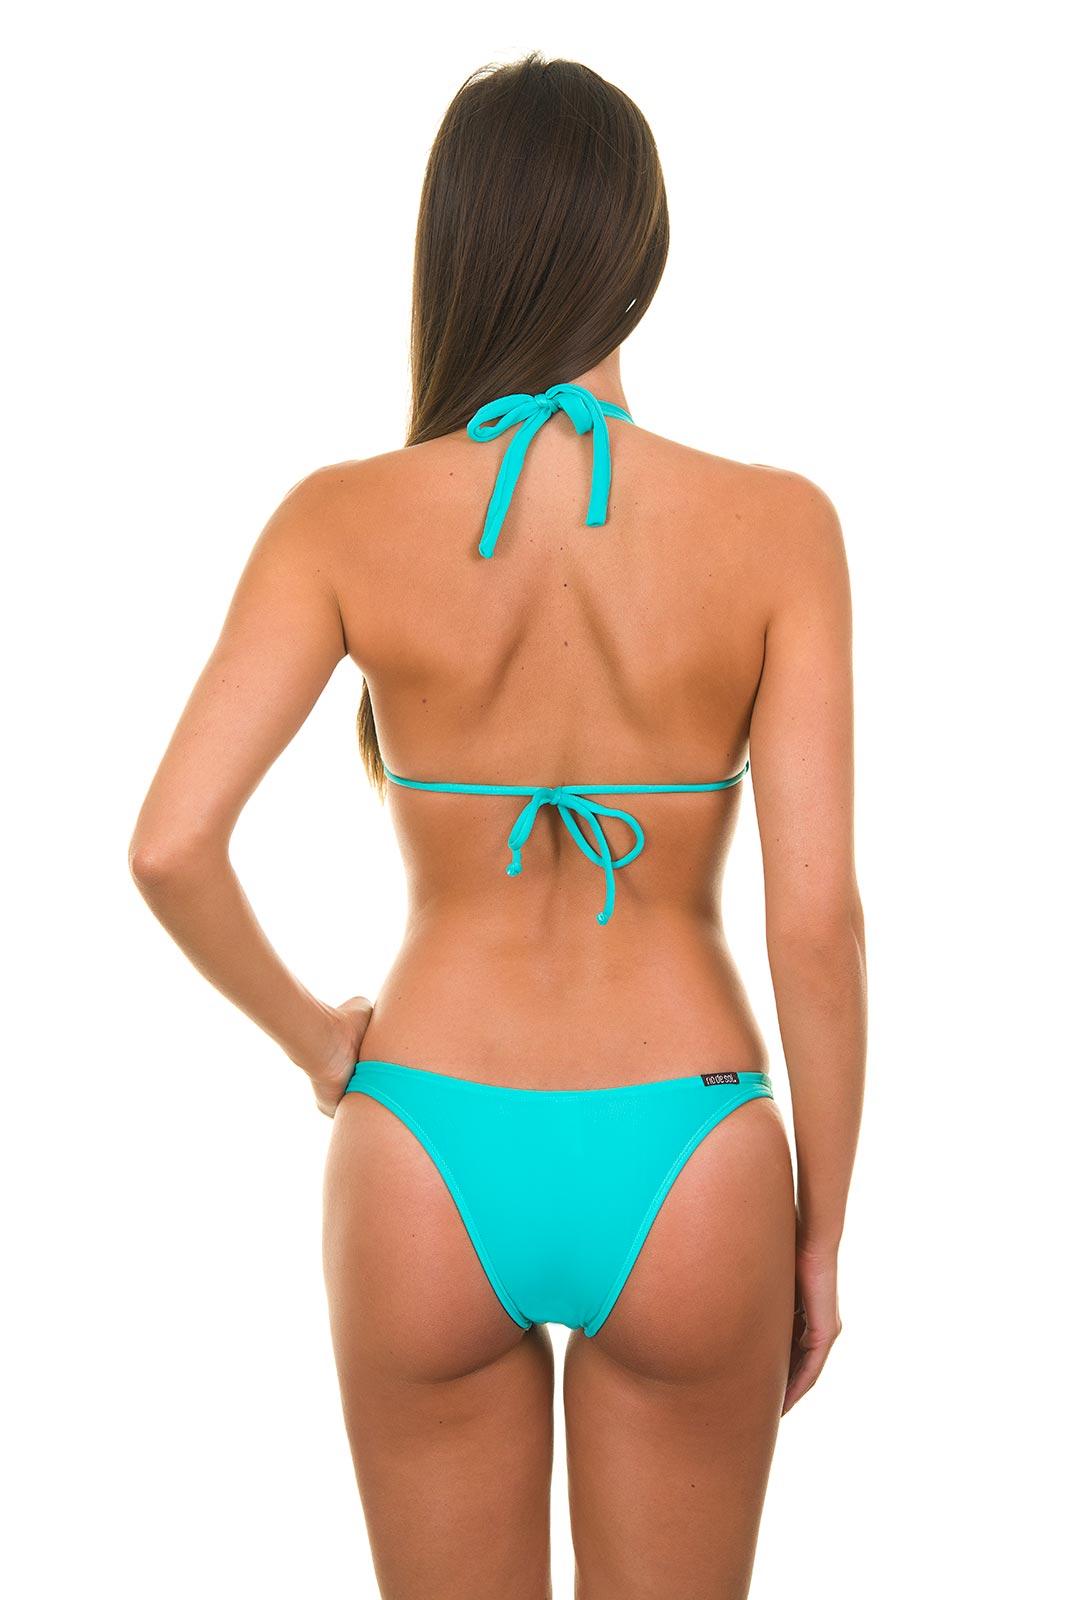 015838176afa7 Sky Blue Push-up Triangle swimsuit - Sky Cortinao Basic - Rio de Sol